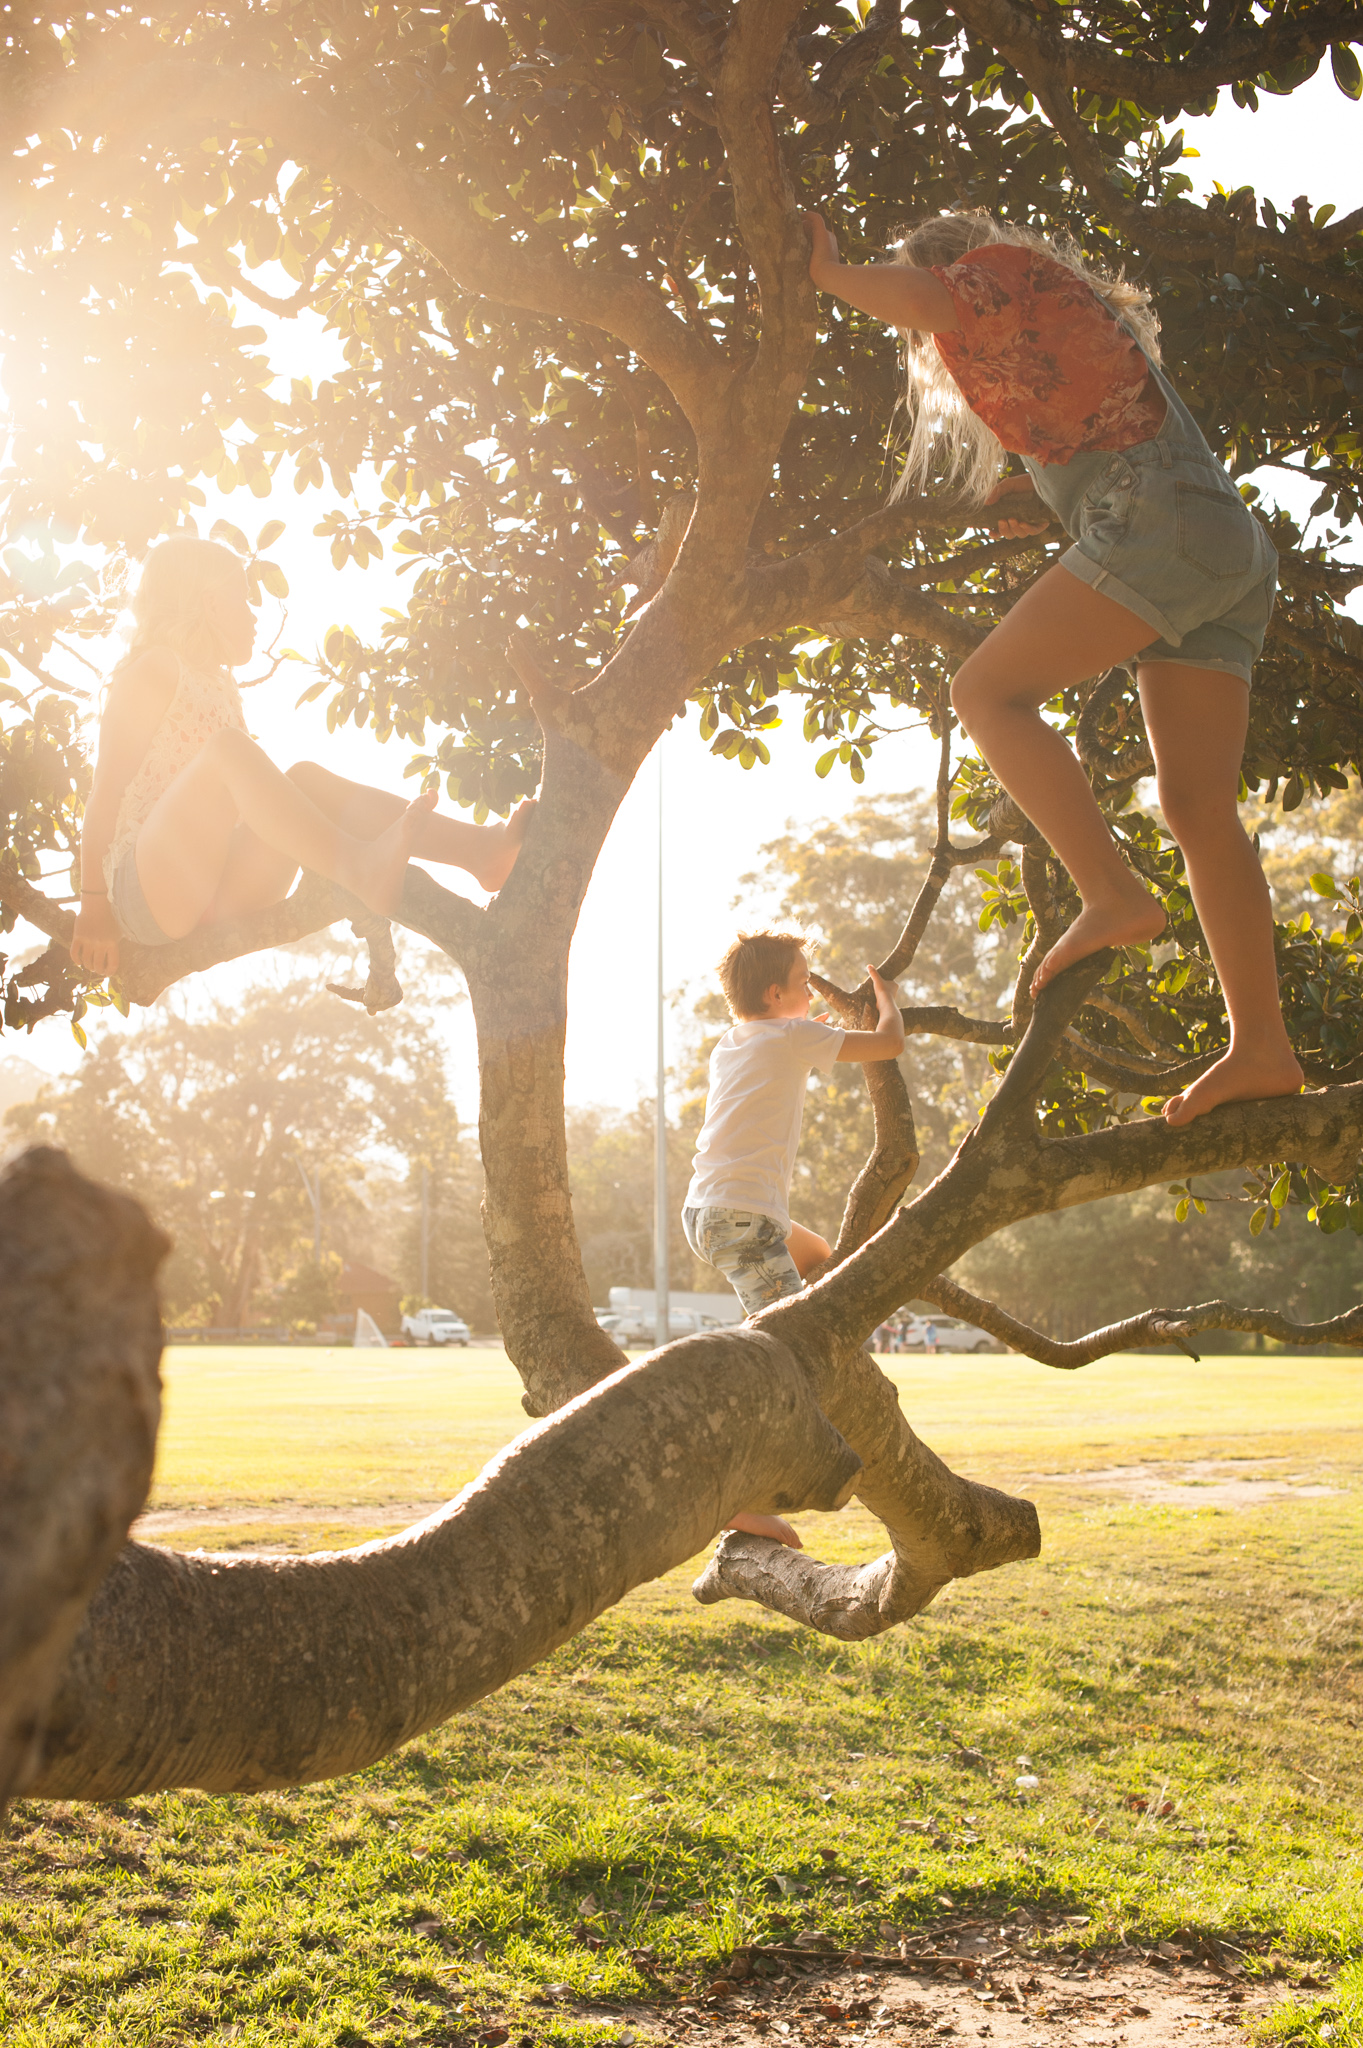 children climbing trees sunset photos avoca beach nsw